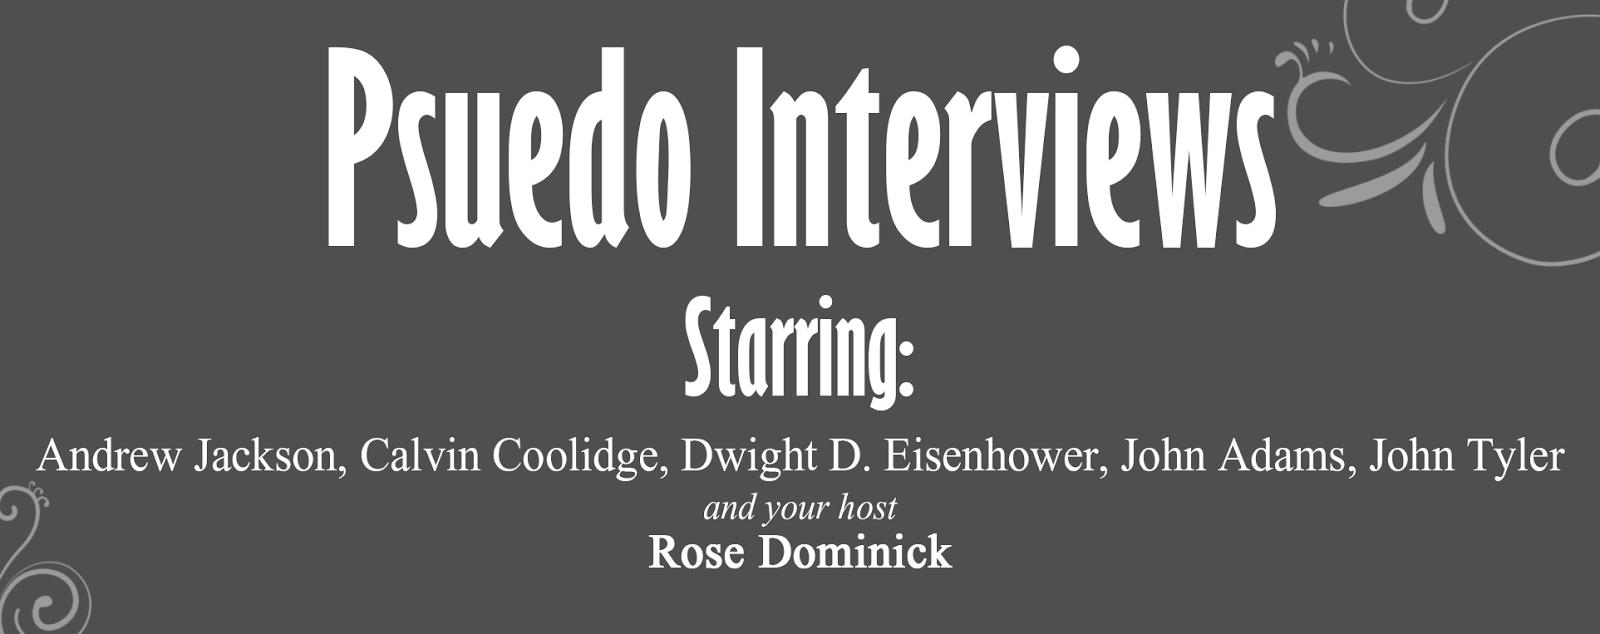 Pseudo Interviews